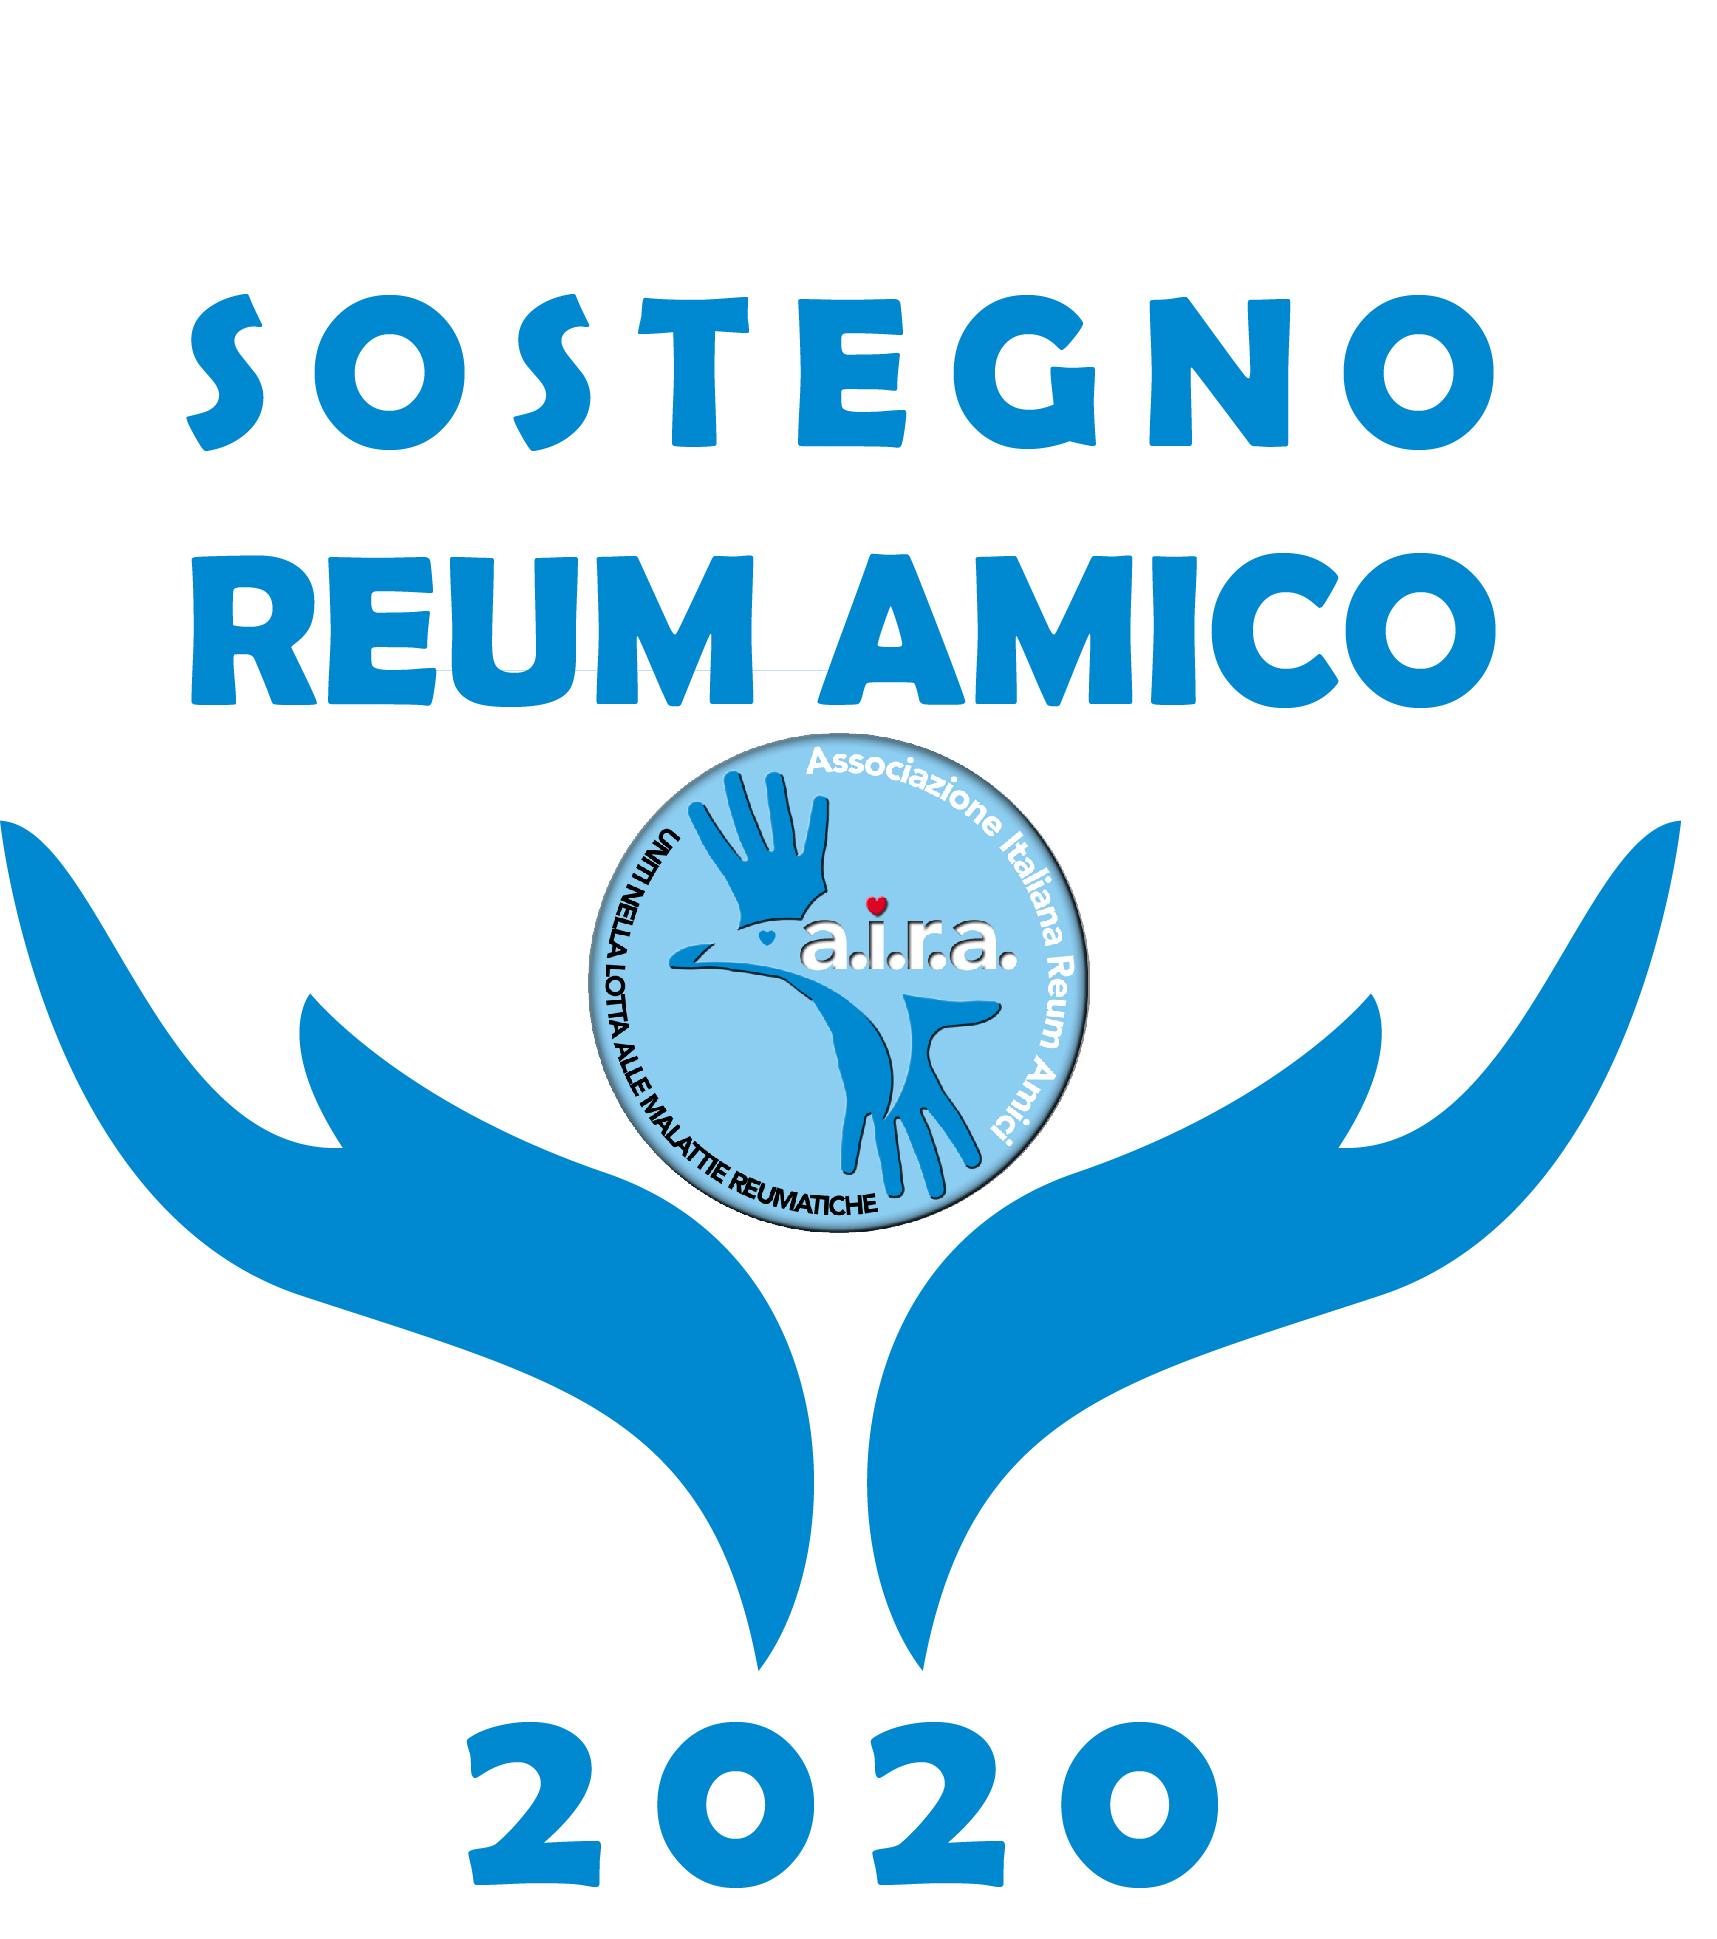 Sostegno Reum Amico - logo 2020